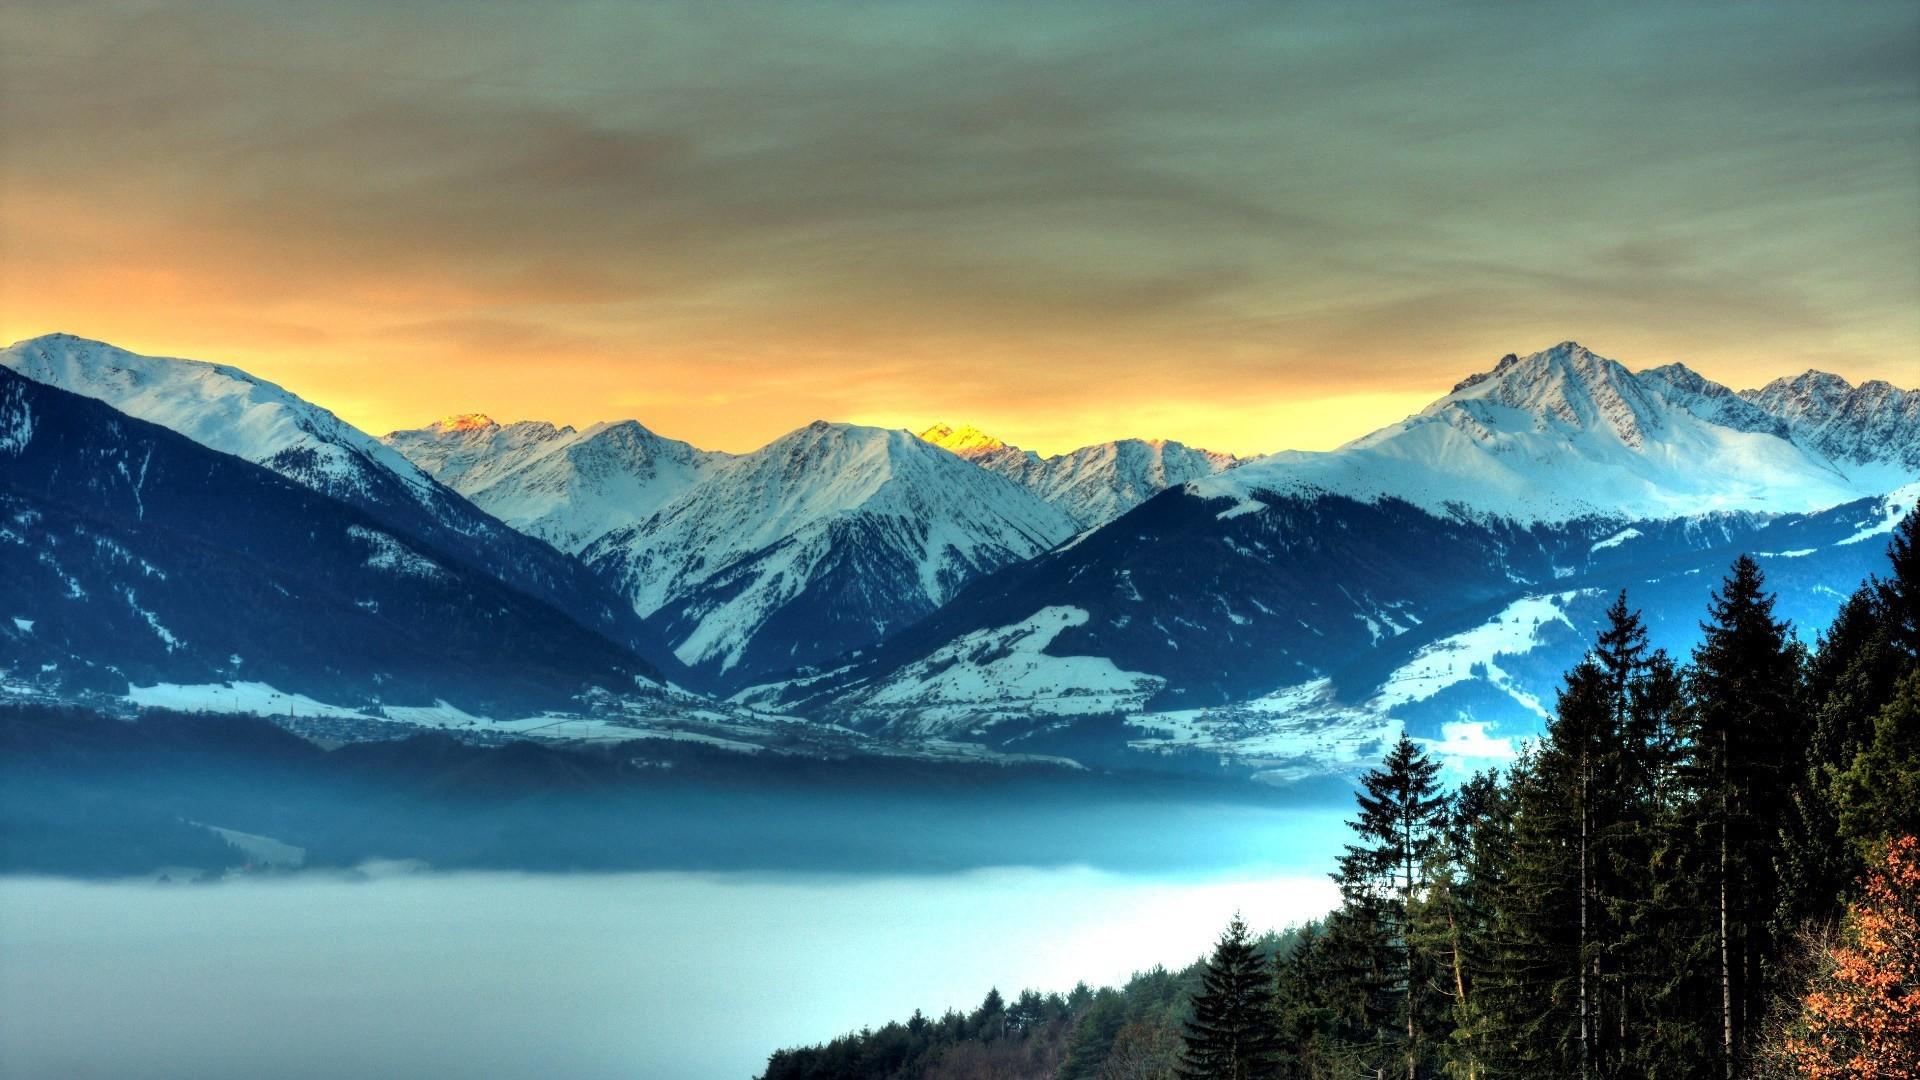 465337 Beautiful-Snowy-Mountain-Wallpaper-HD …